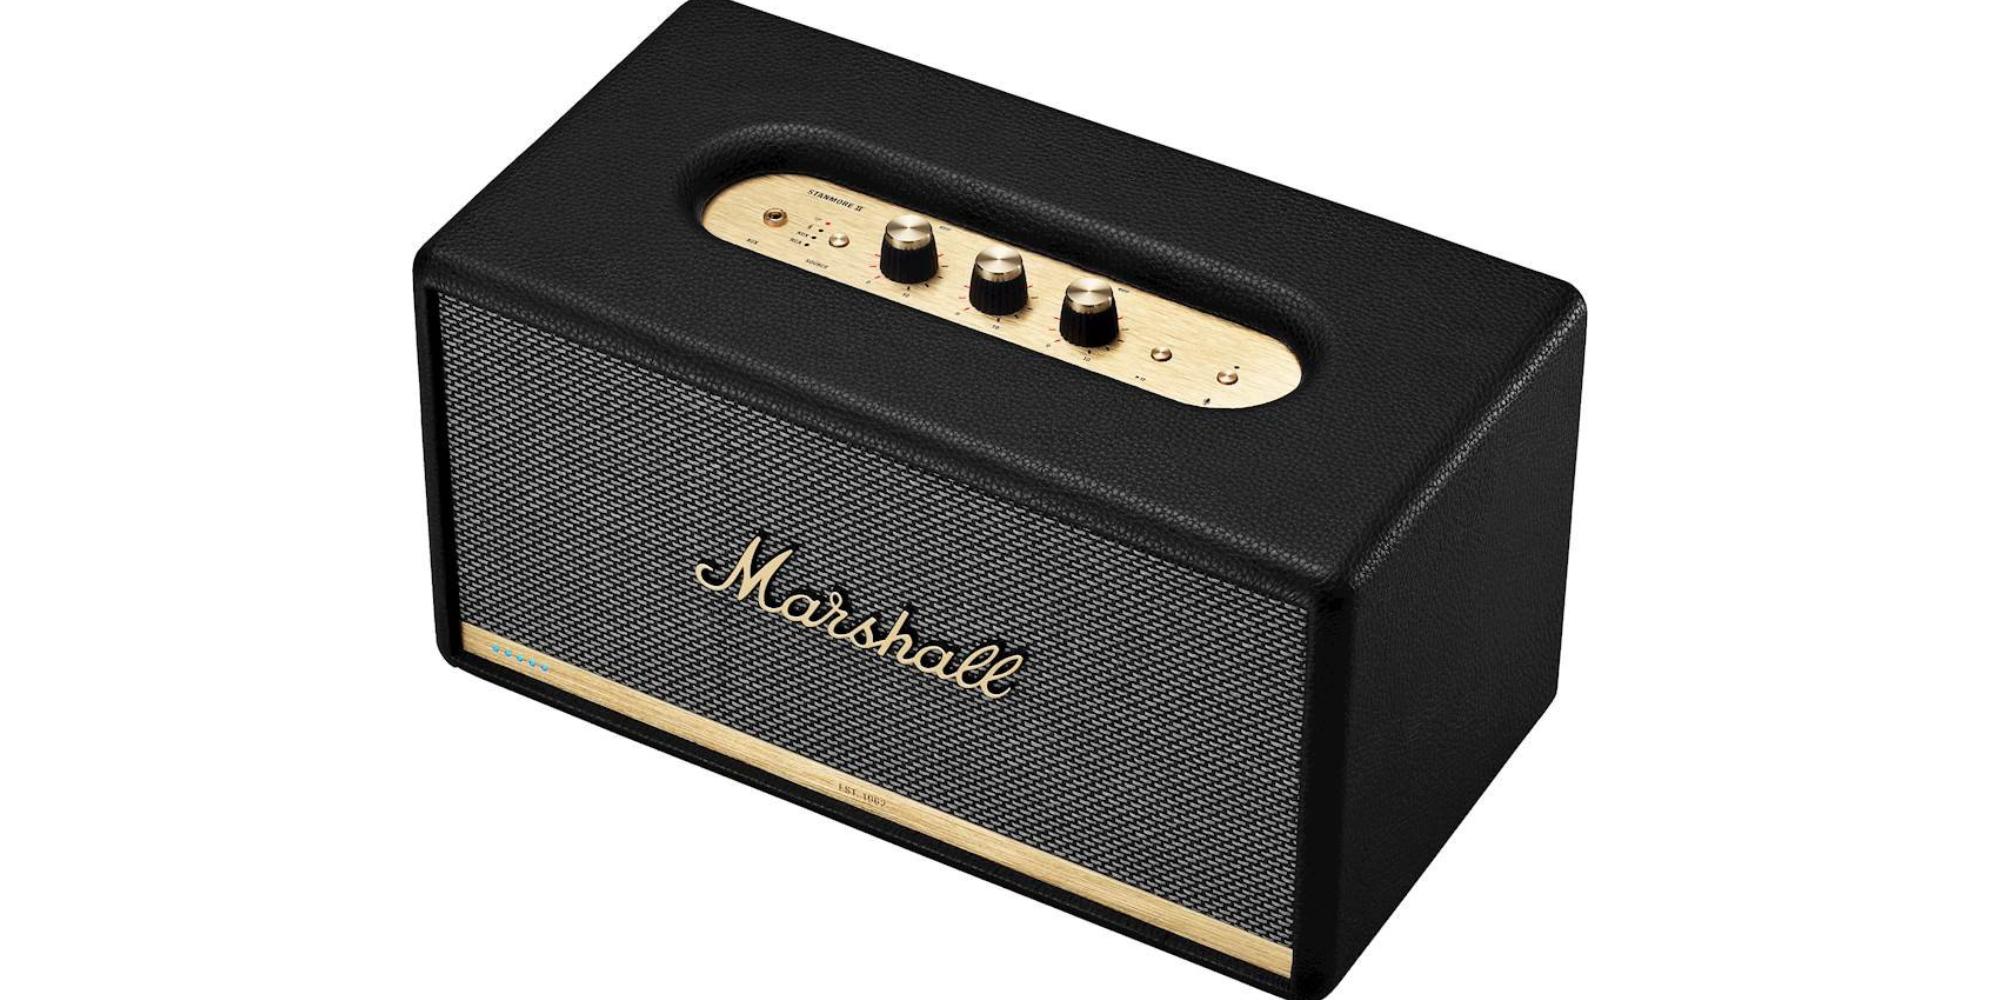 Bundle Marshall's Stanmore Speaker + Major III Headphones at $300 ($520 value) - 9to5Toys